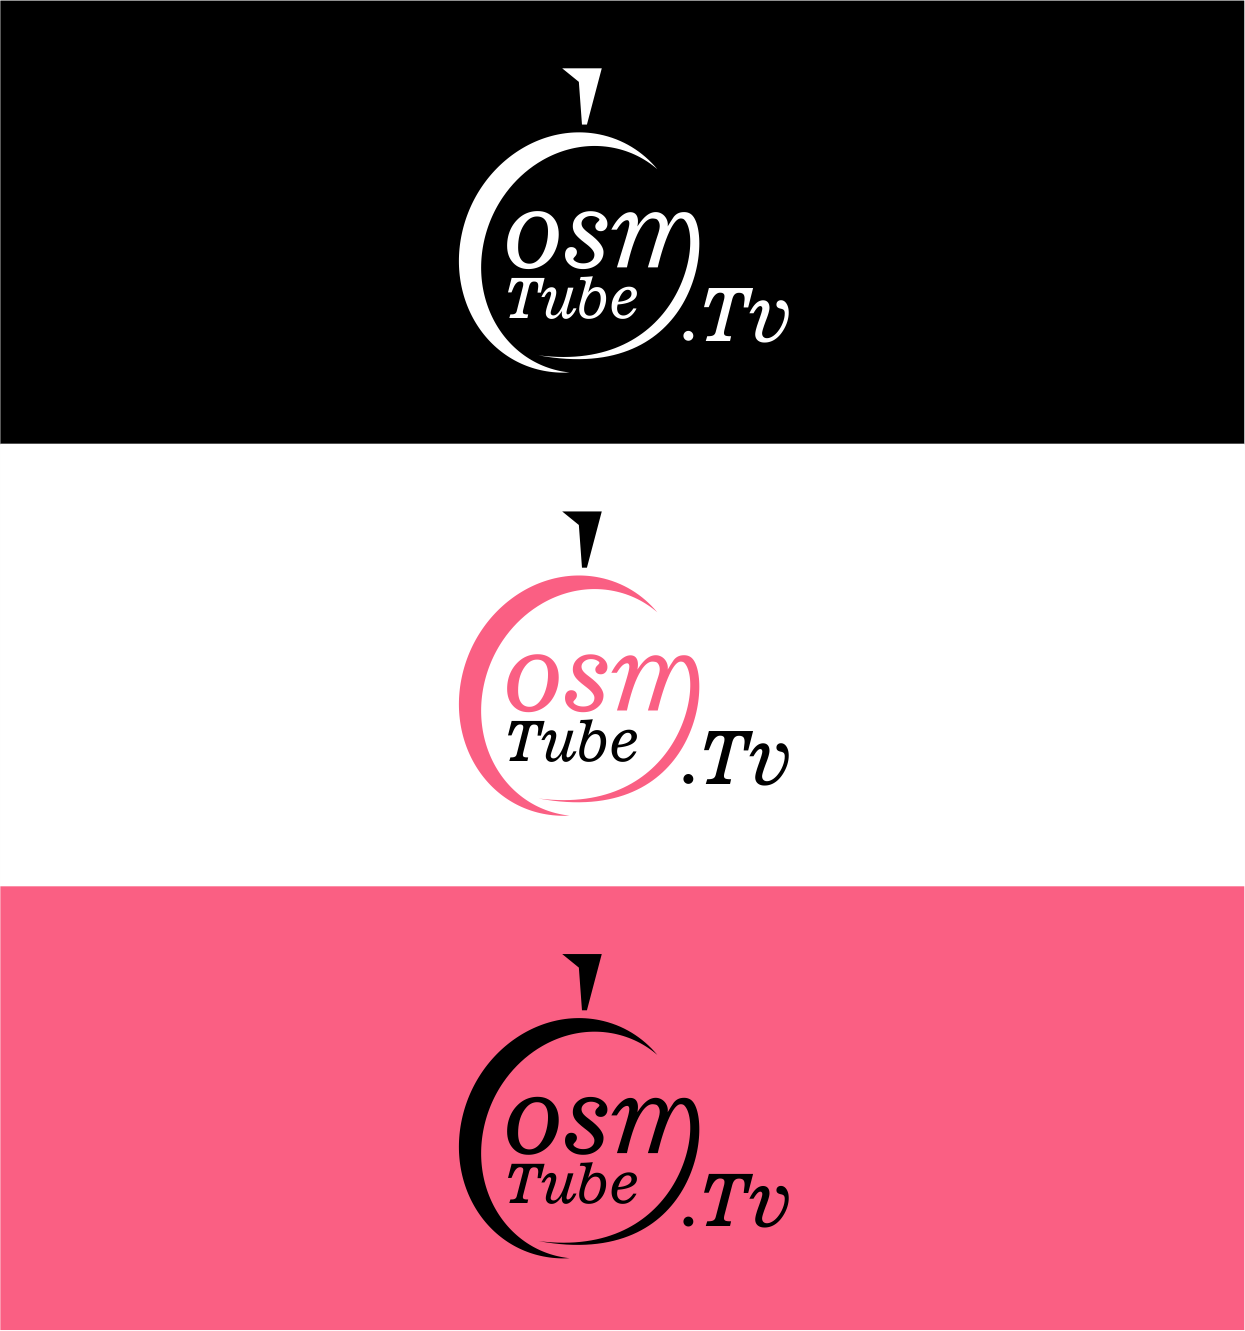 Создание логотипа фото f_88159dfbd1235b55.png